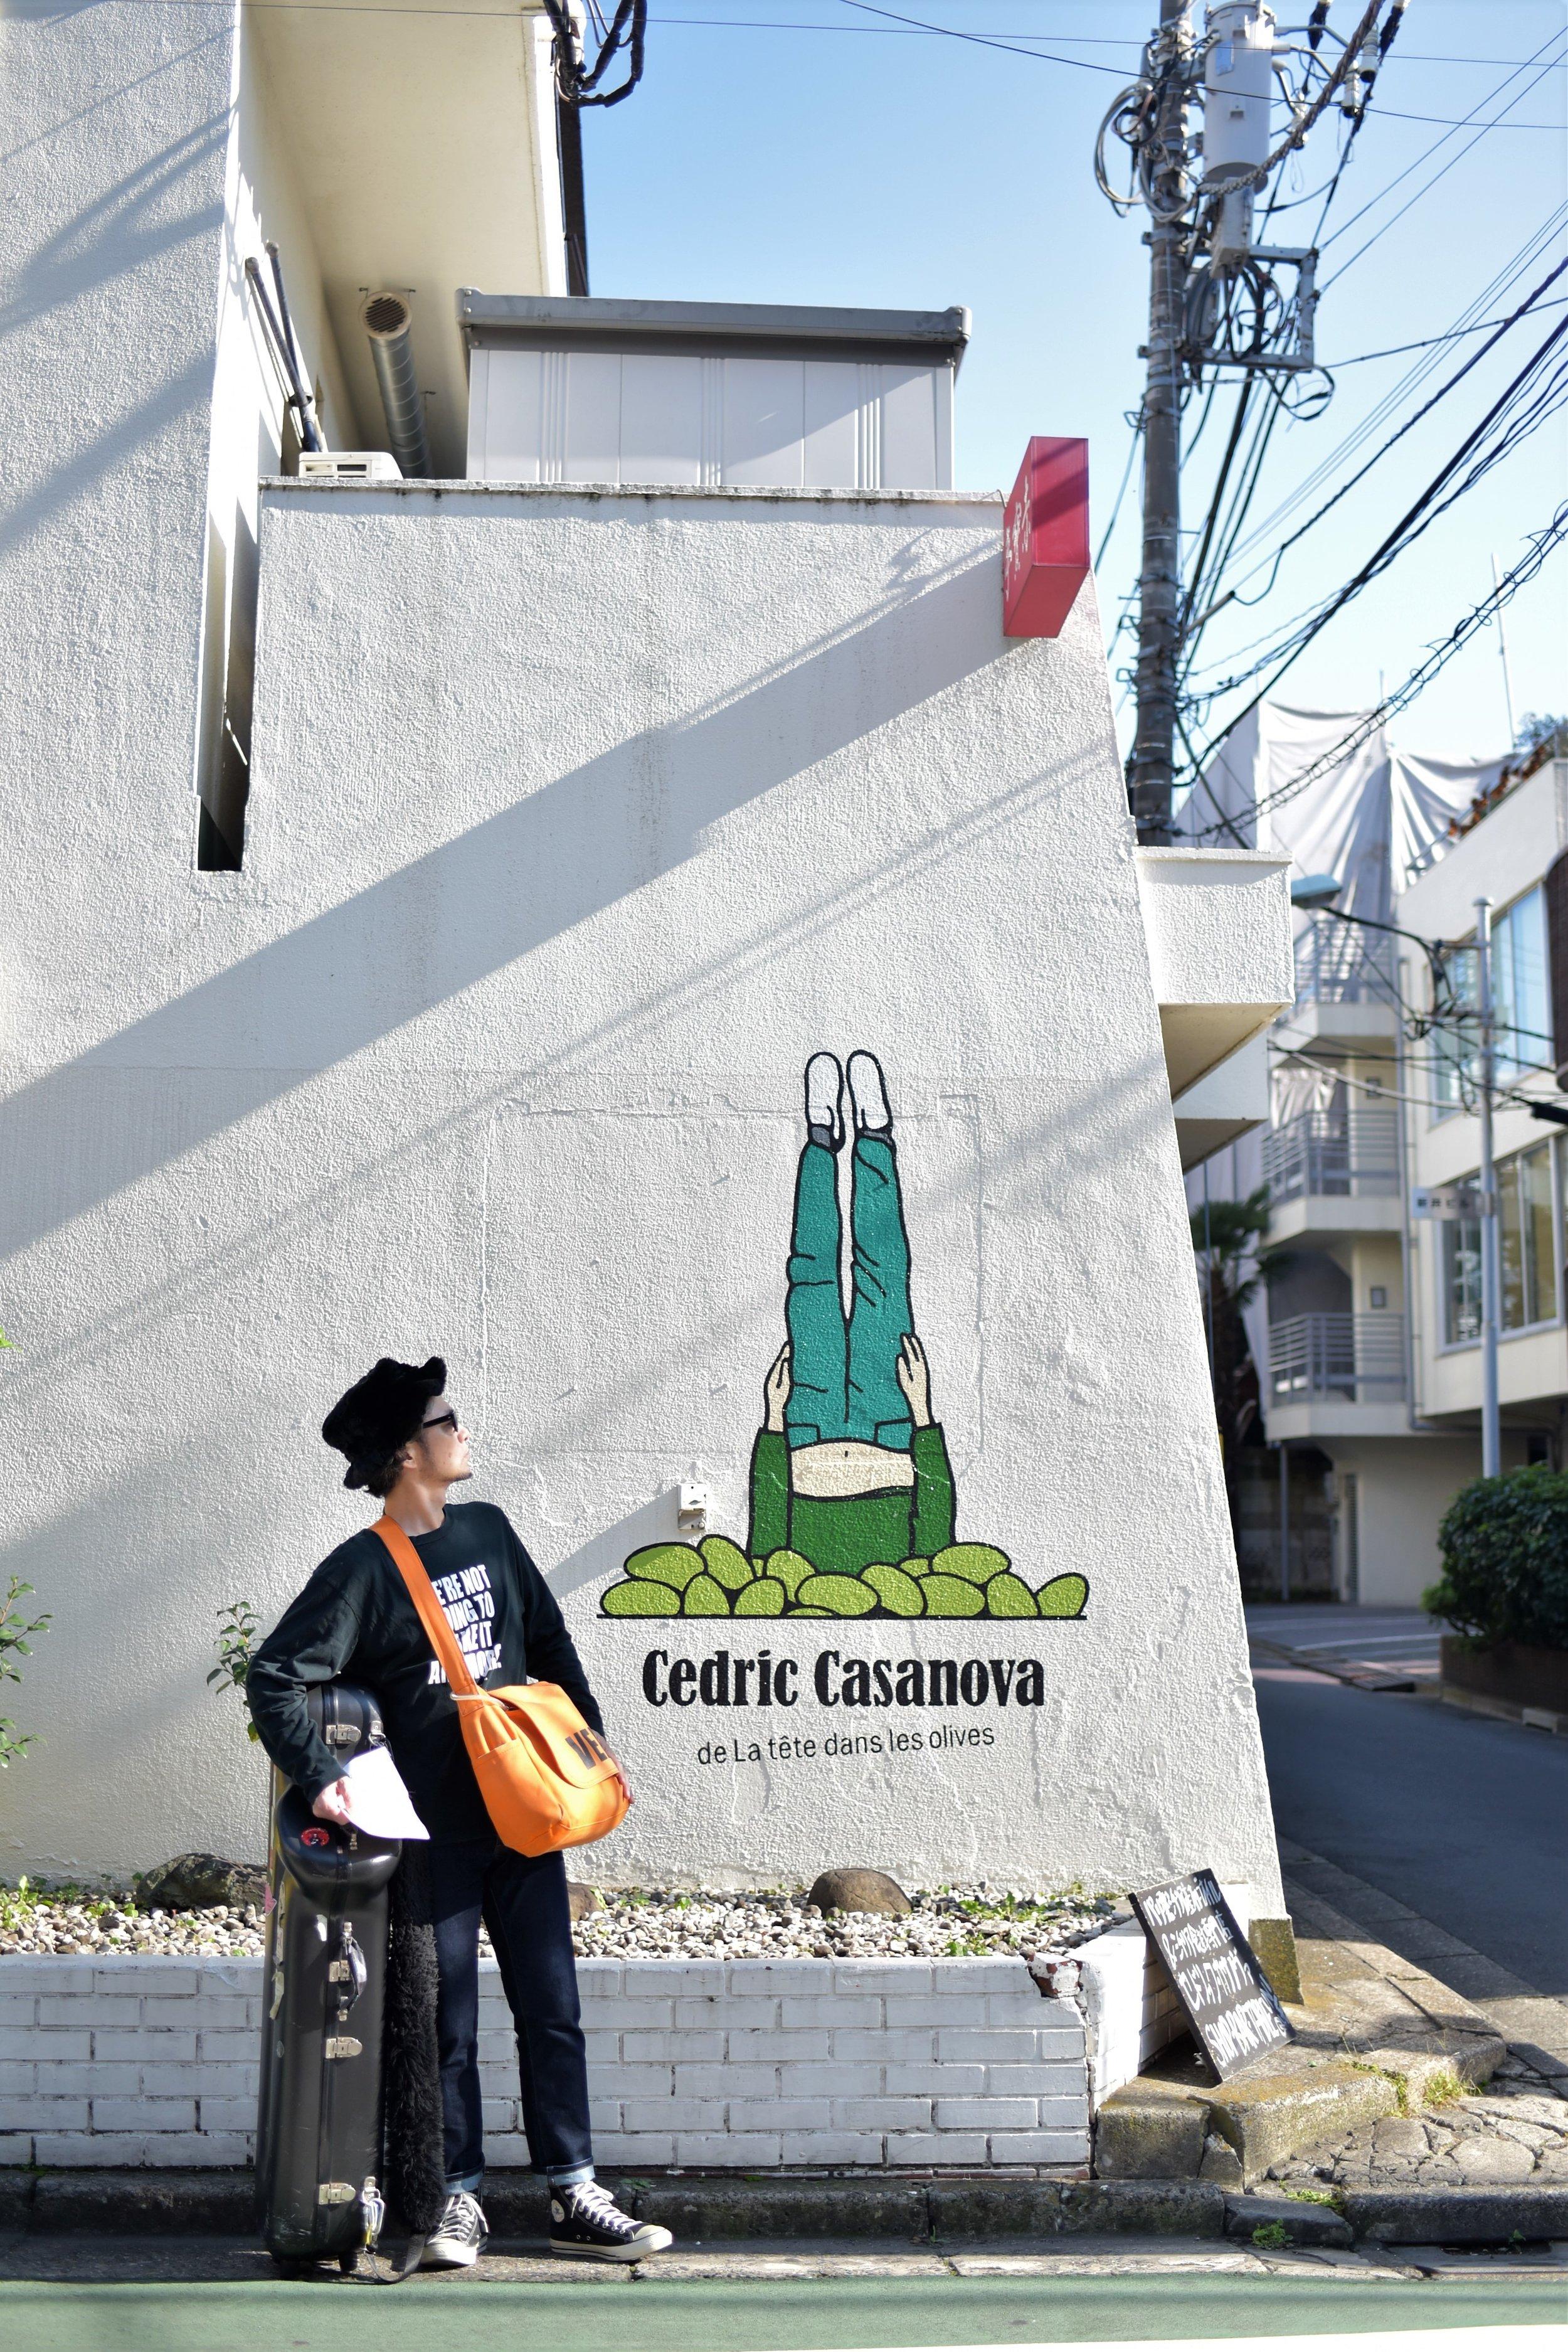 Cedric Casanova